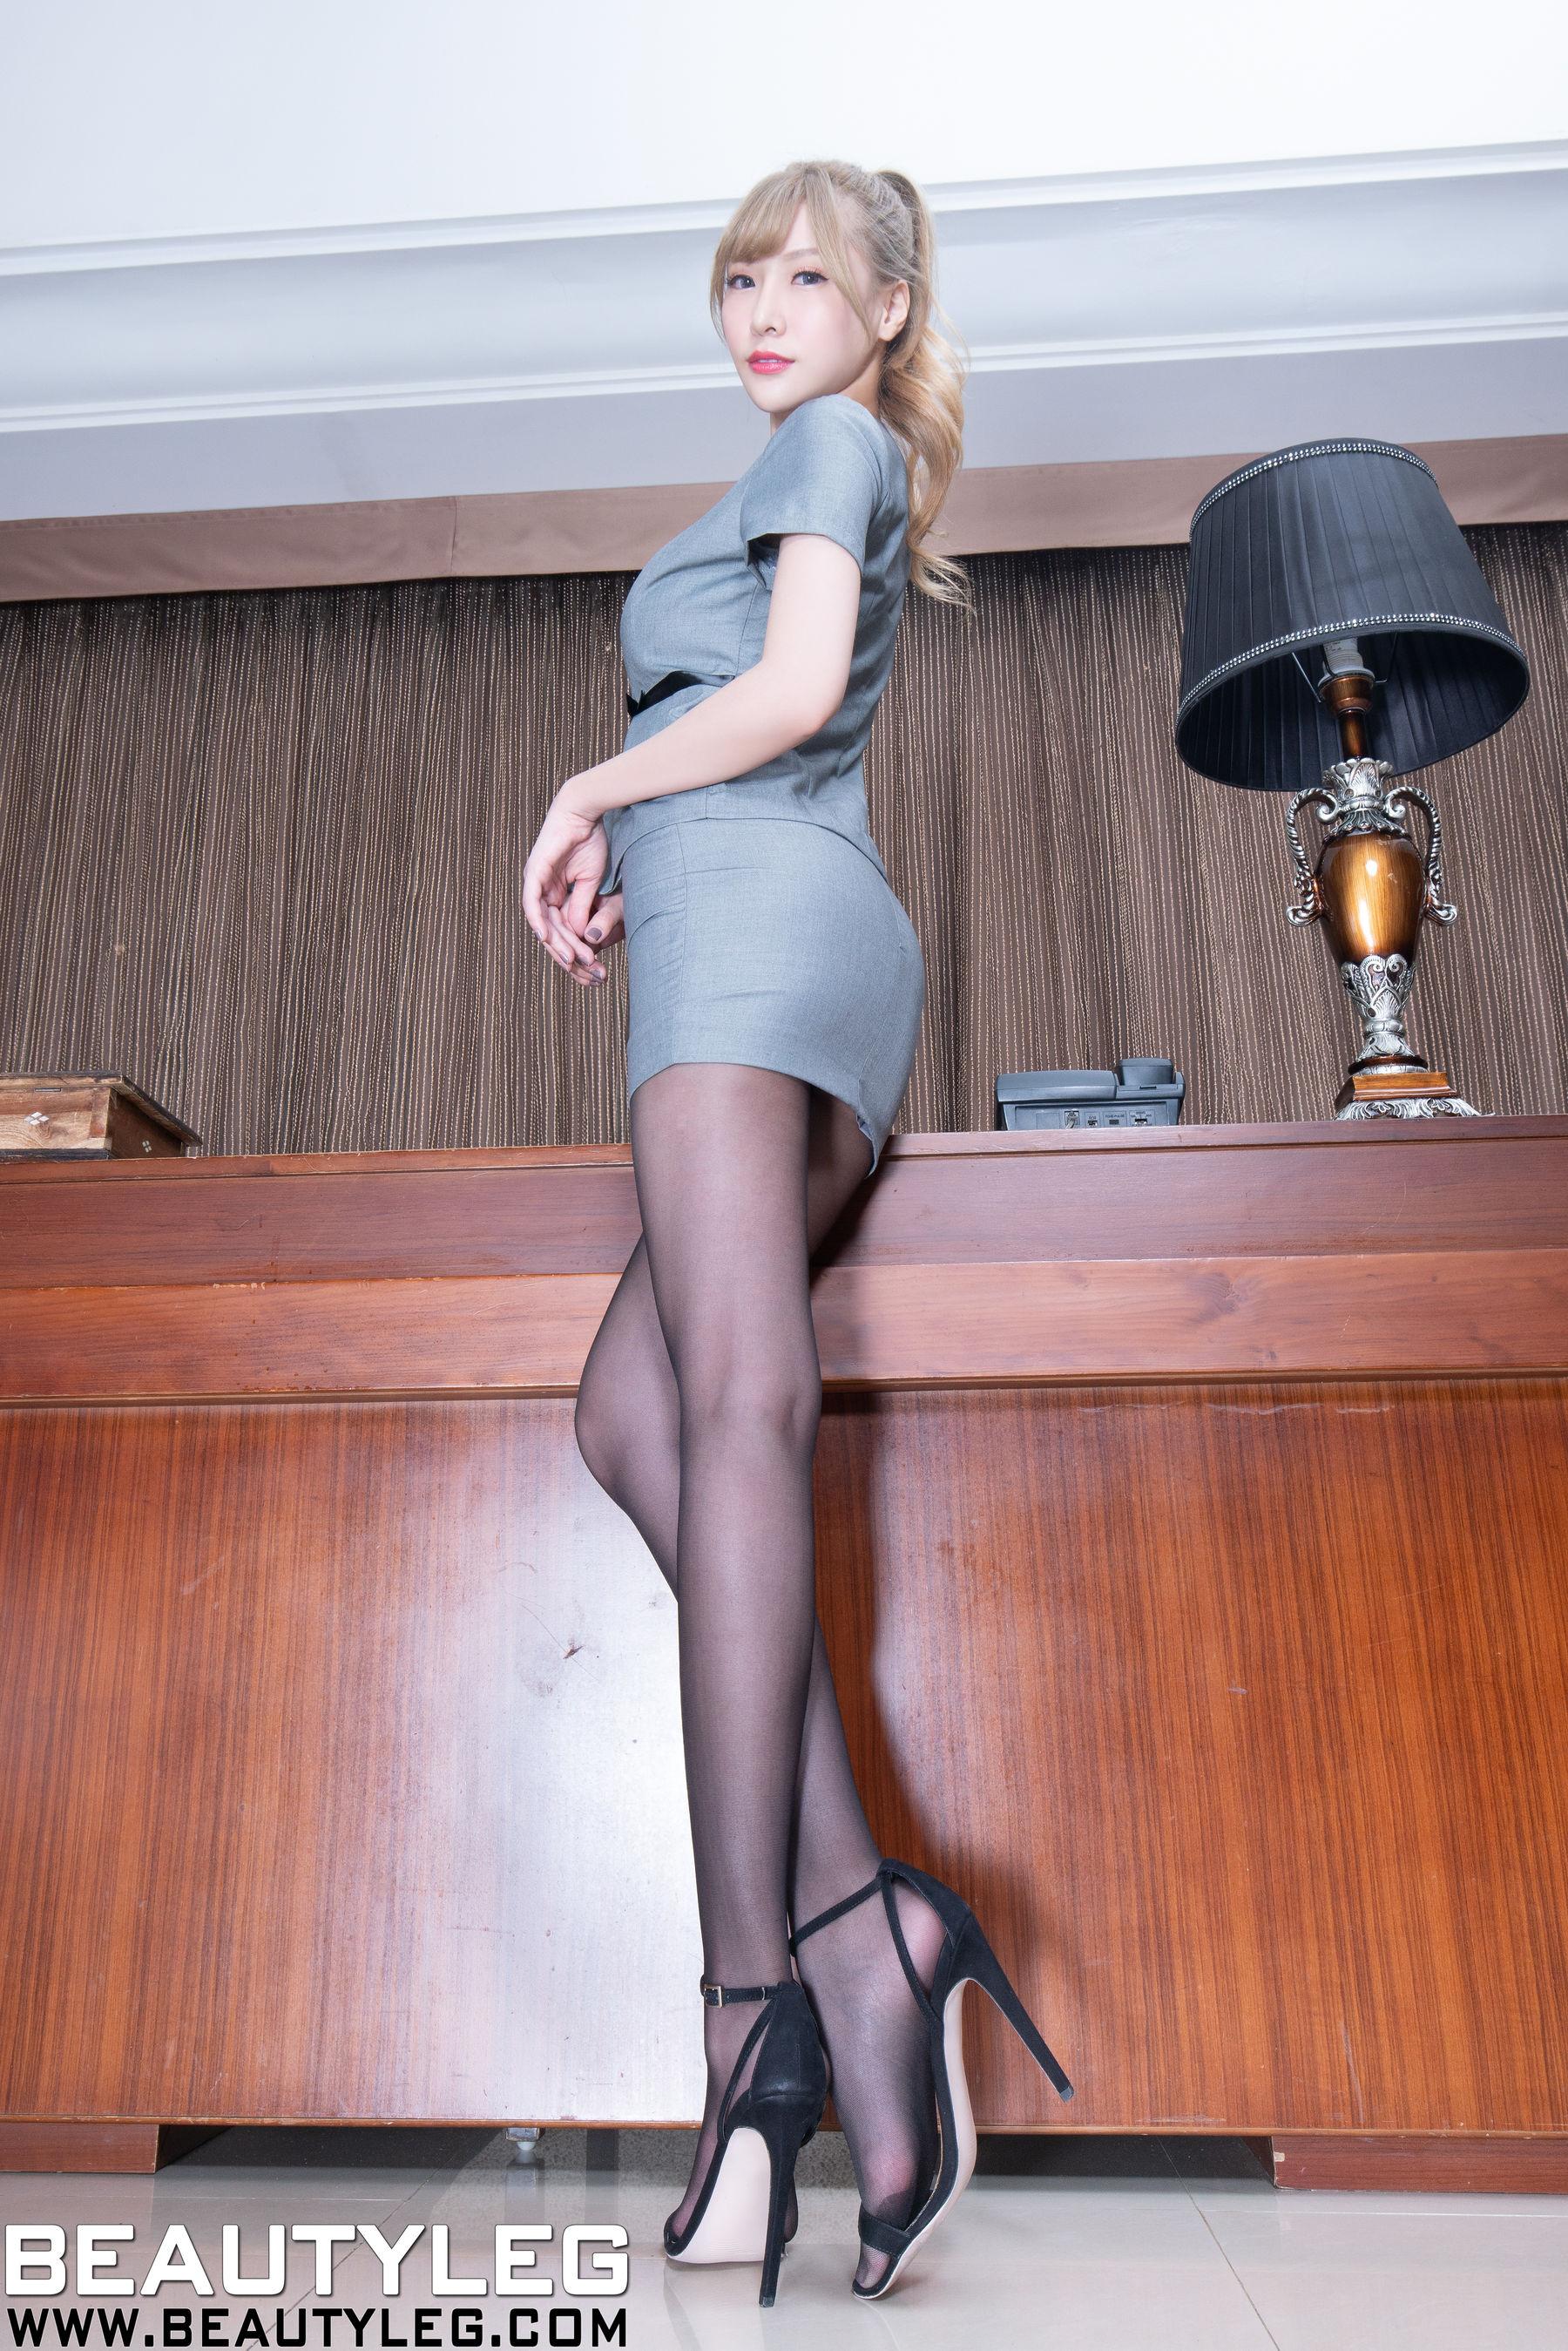 VOL.489 [Beautyleg]高跟长腿美女黑丝美腿:李小星(Beautyleg腿模Xin)超高清个人性感漂亮大图(49P)